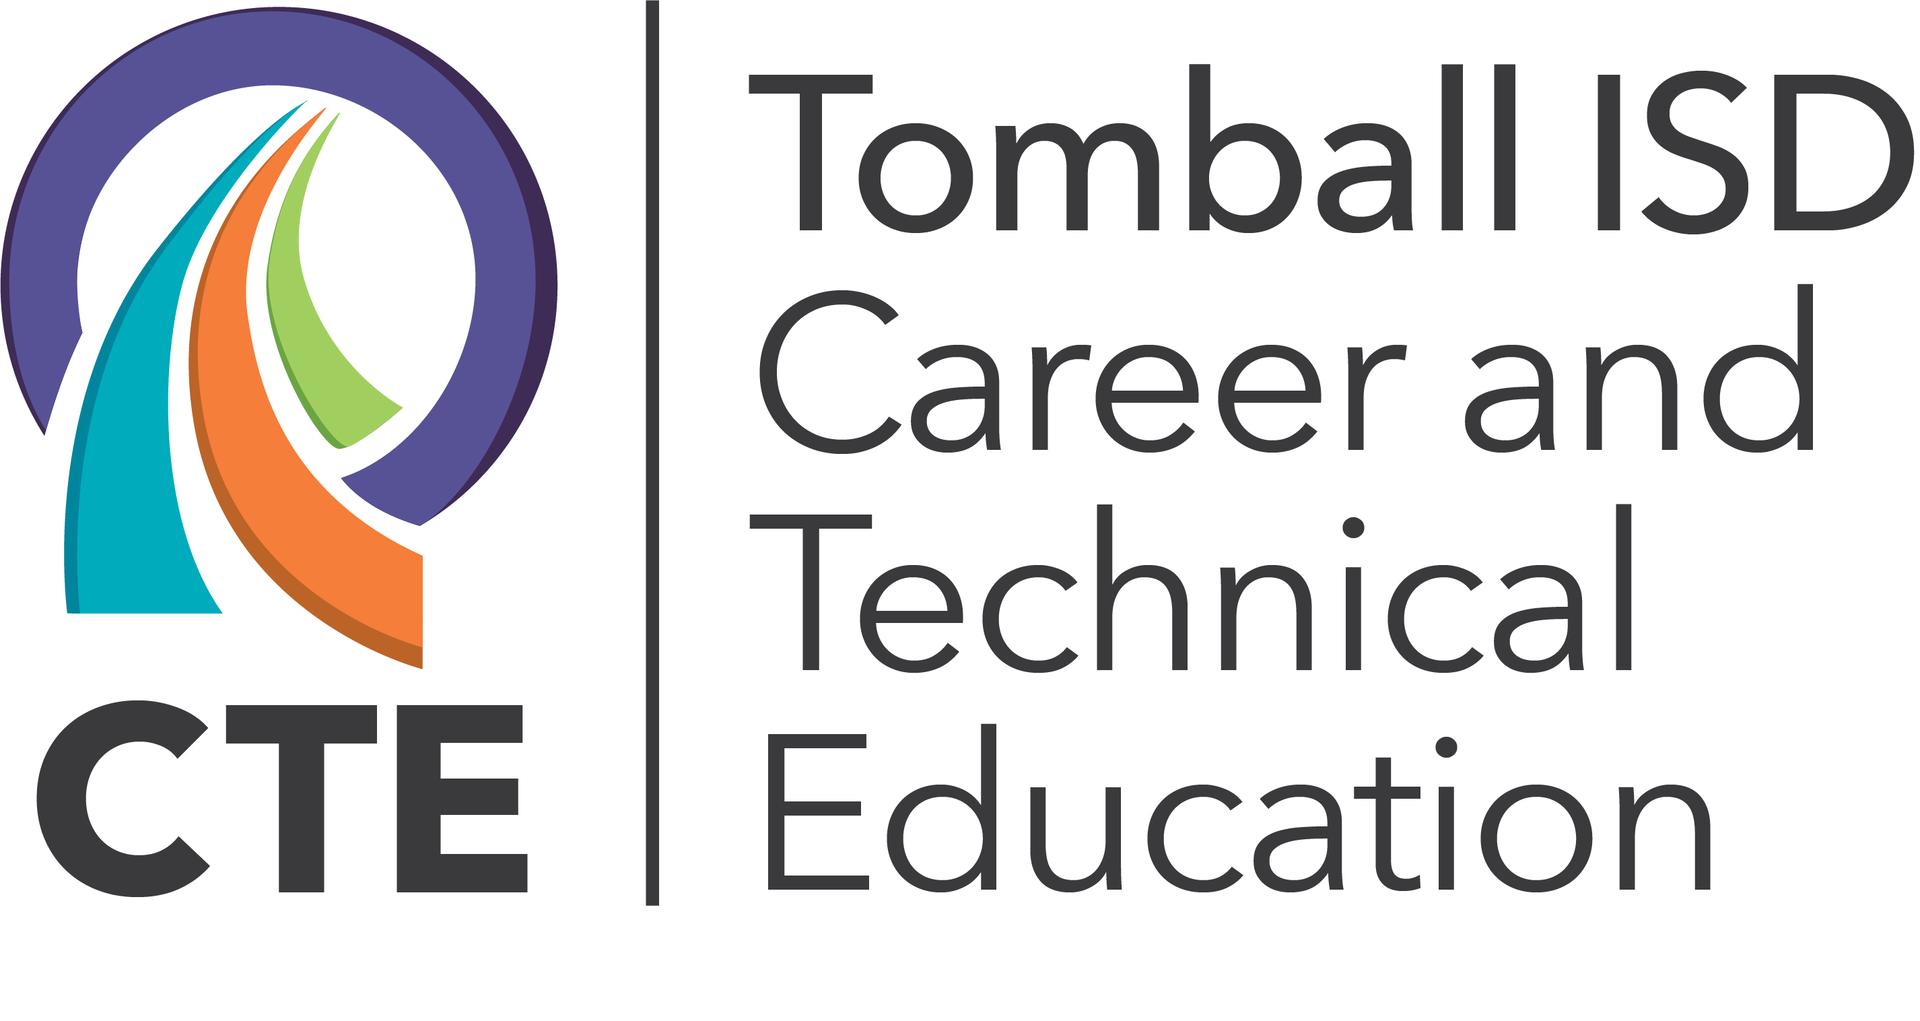 Tomball ISD Career & Technical Education logo